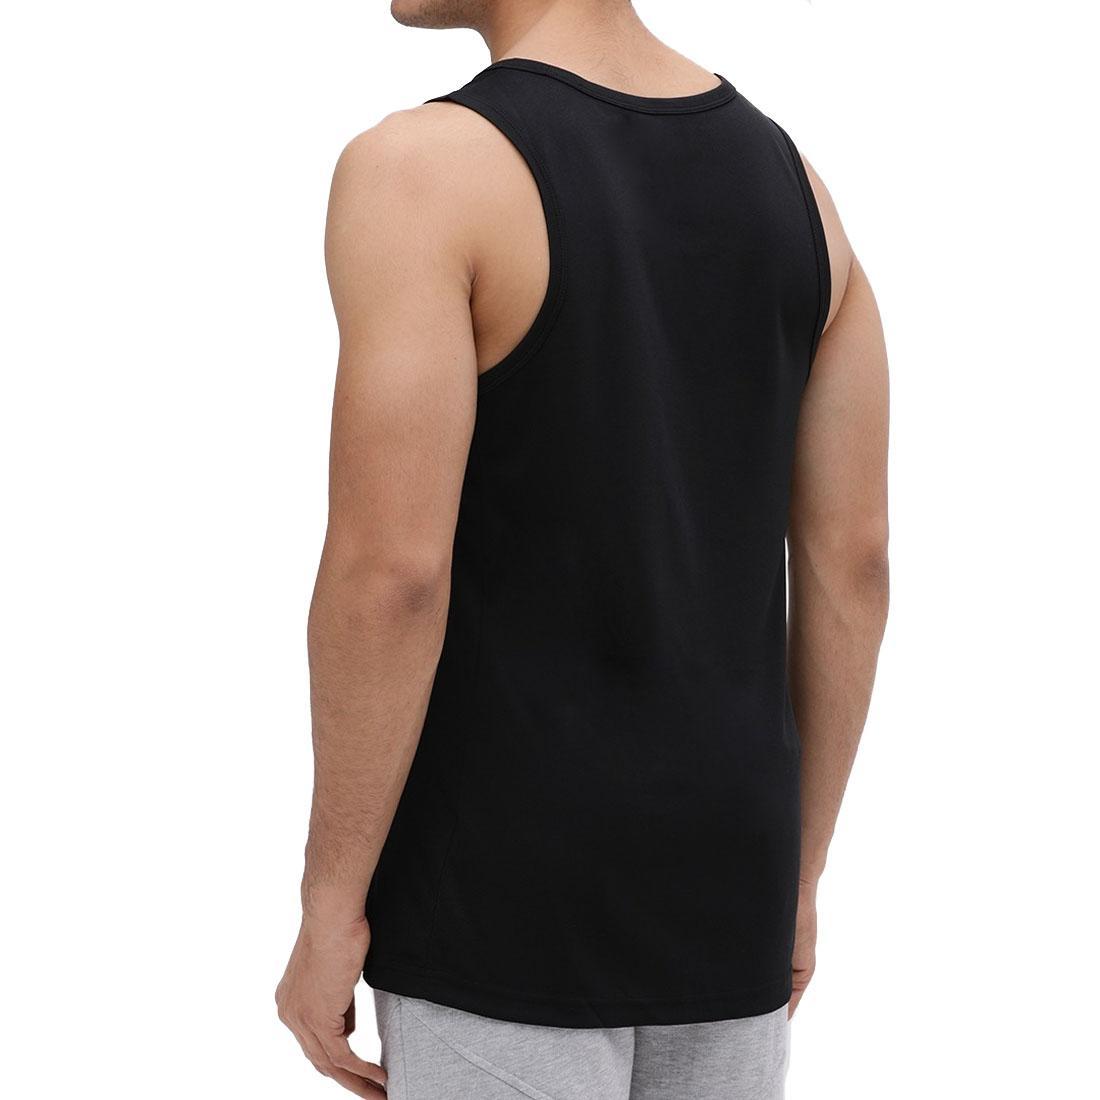 reputable site 349b9 2ac5f Nike Swoosh Mens Black Blue Vest Retro Sports Gym Sleeveless Athletic Tank